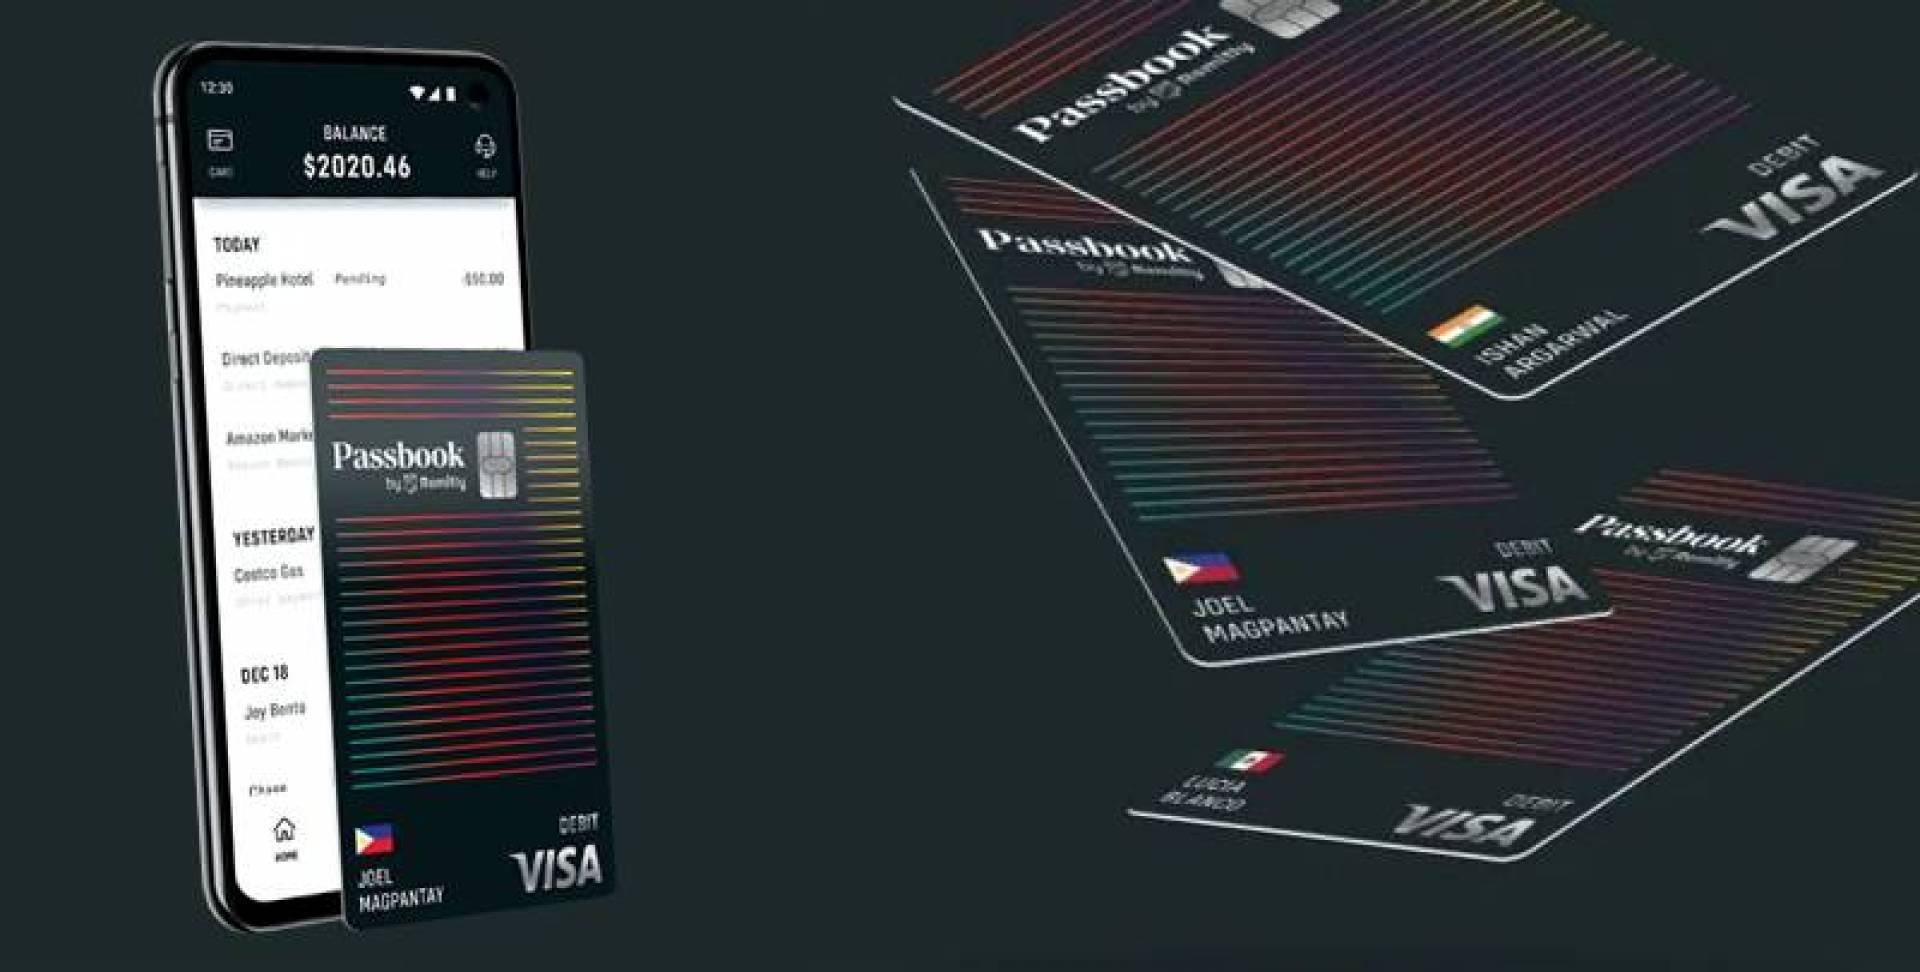 Passbook.. حسابات مصرفية للمغتربين